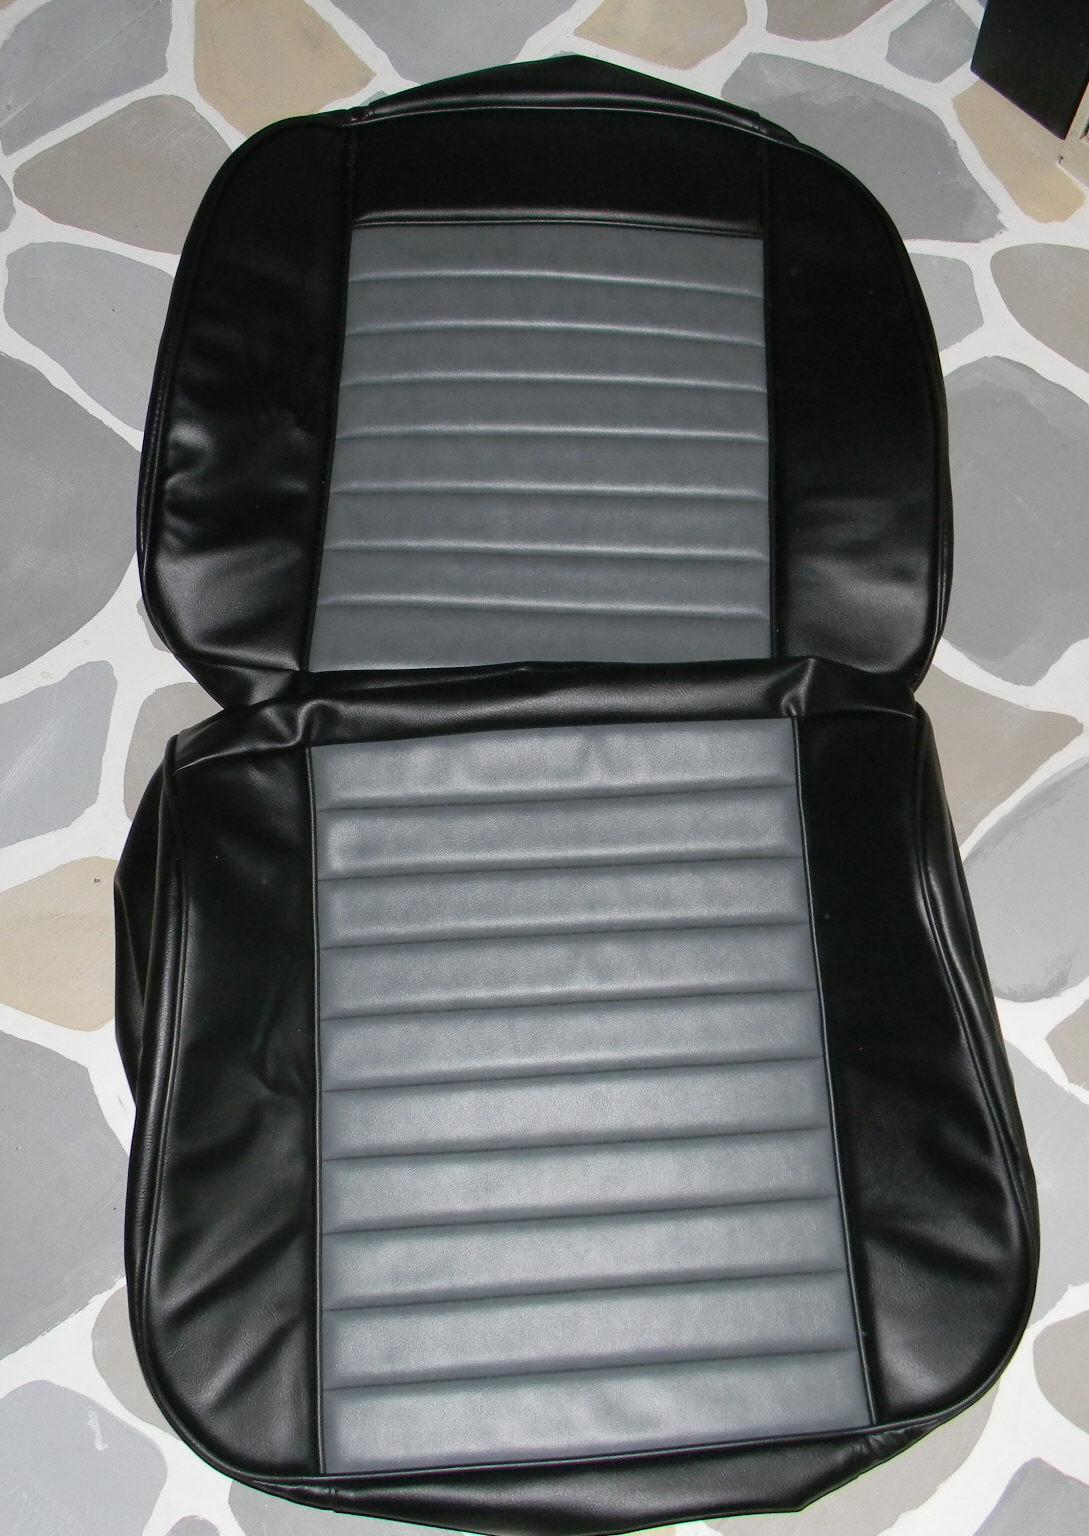 Chevy Truck Seat Covers >> K5 Blazer / Bucket Seat Covers / Rick's Custom Upholstery